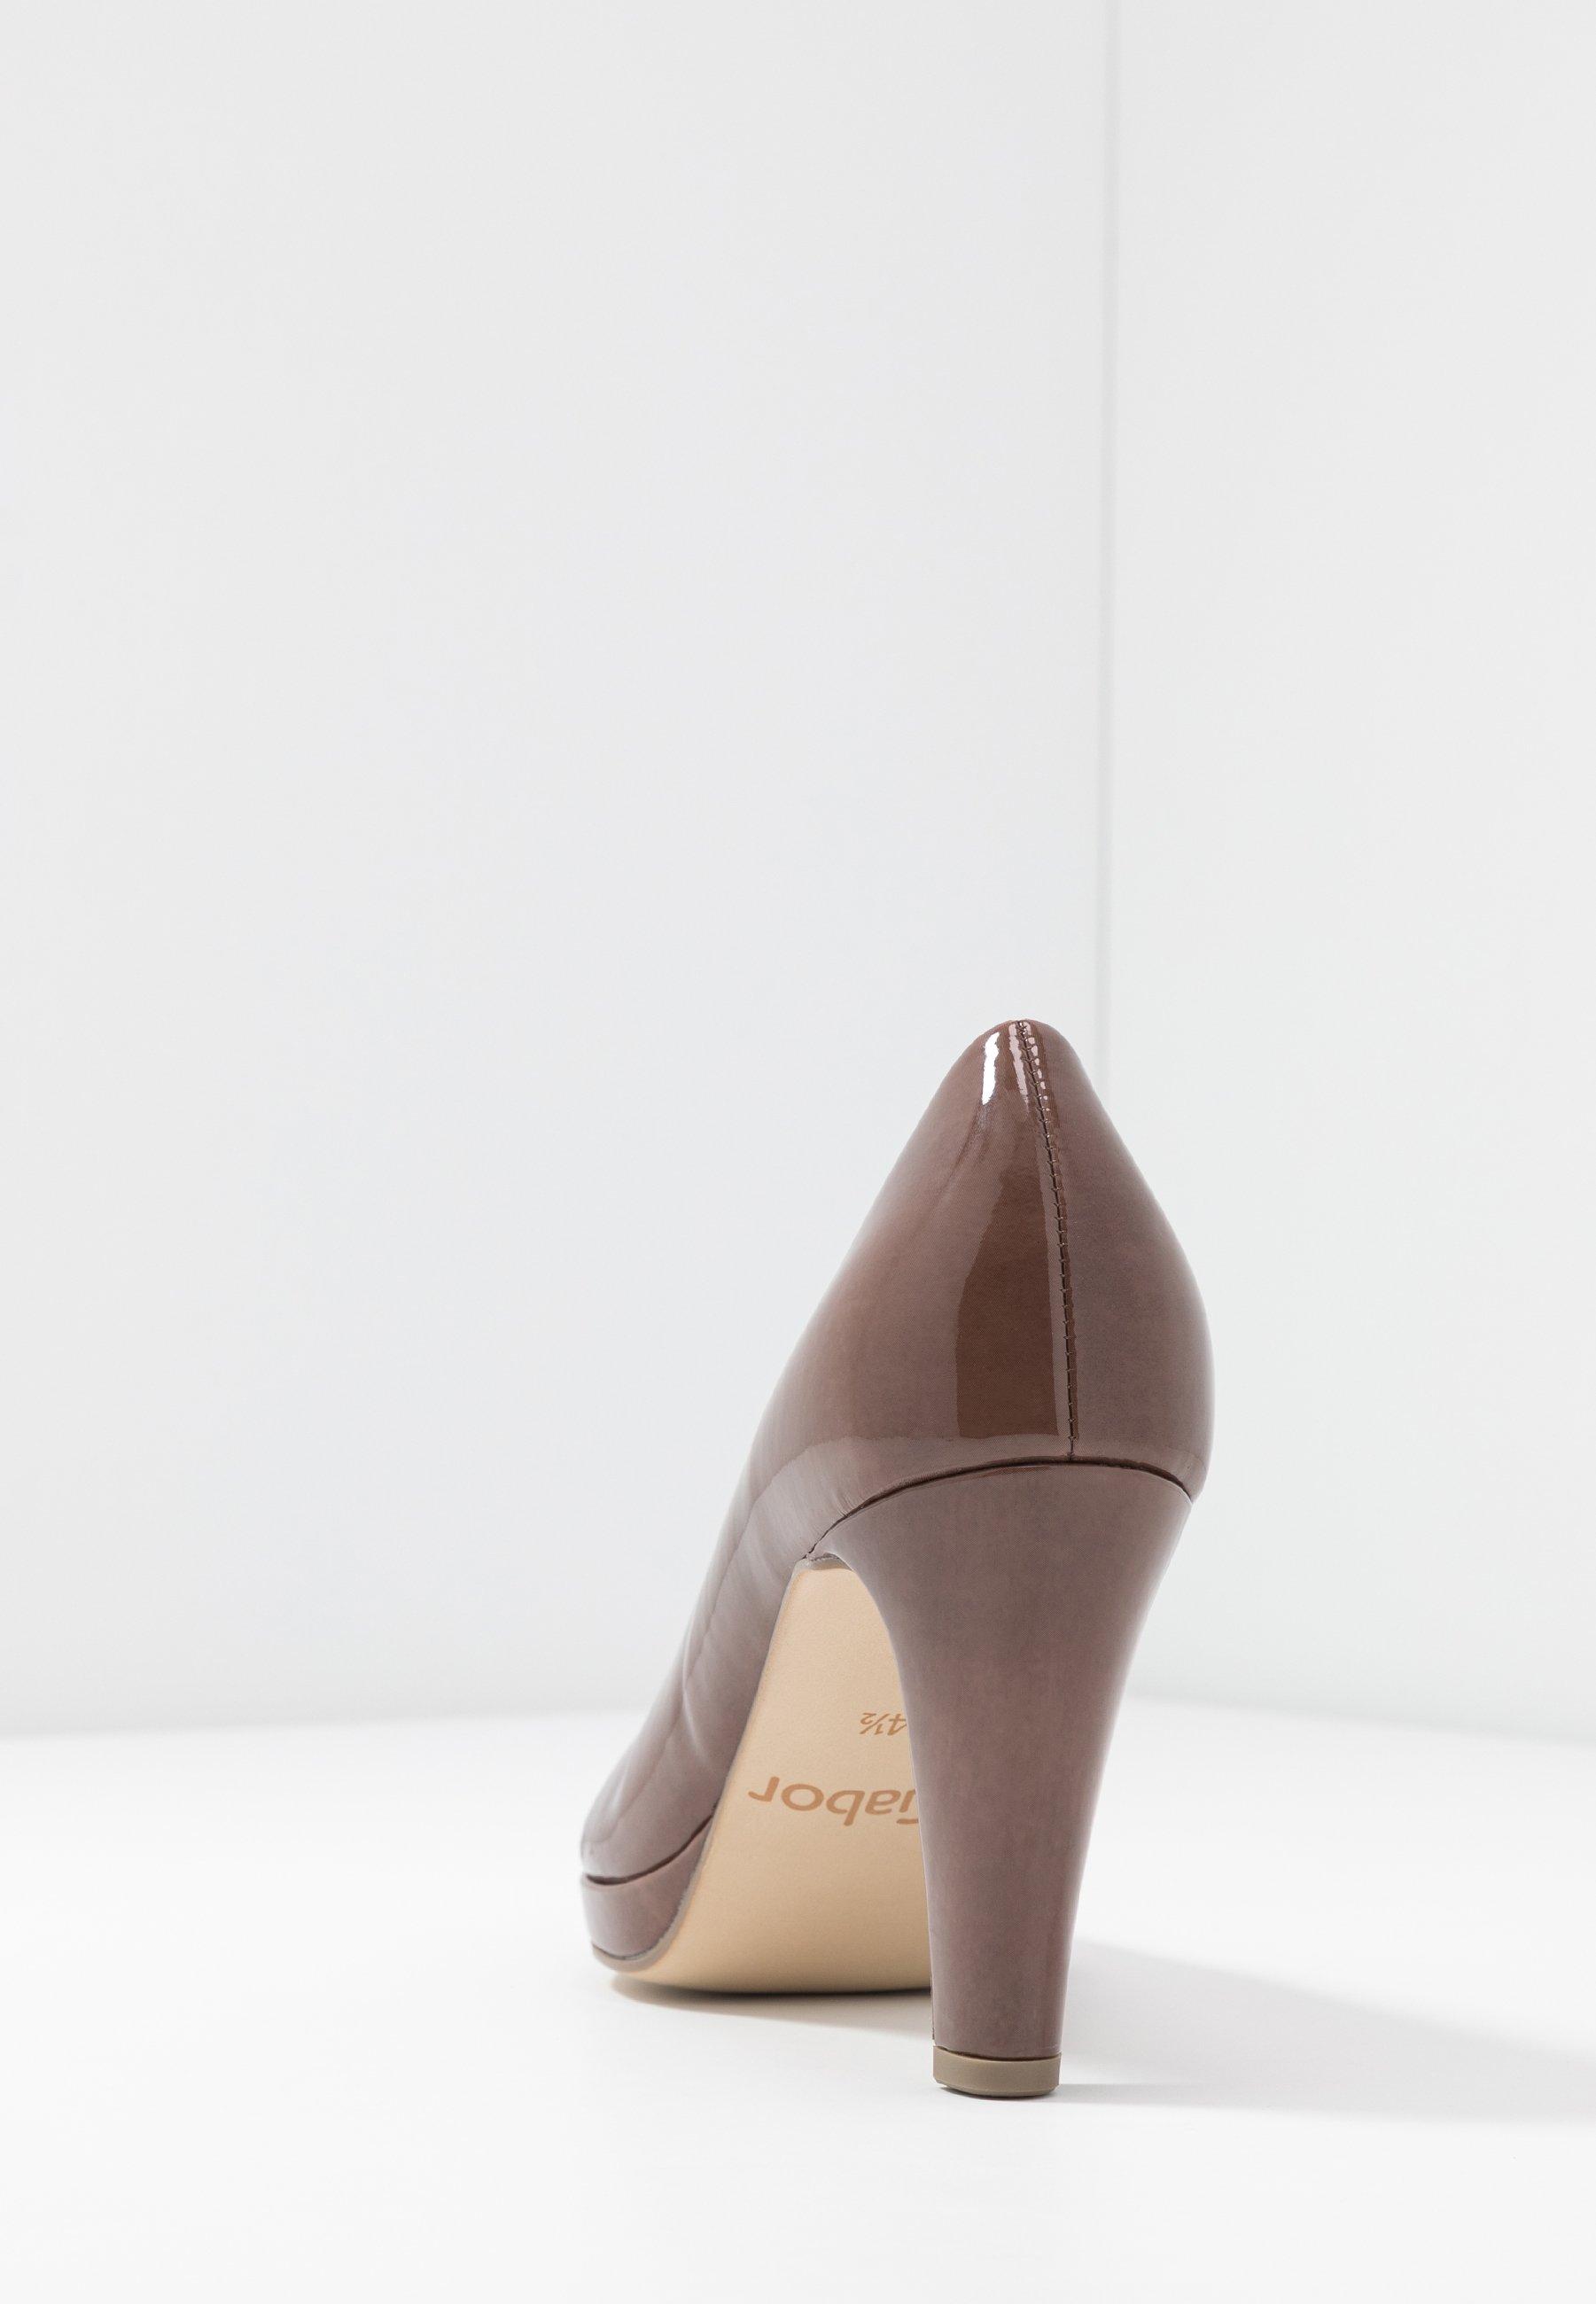 Gabor High Heel Pumps - Dark Nude/nude